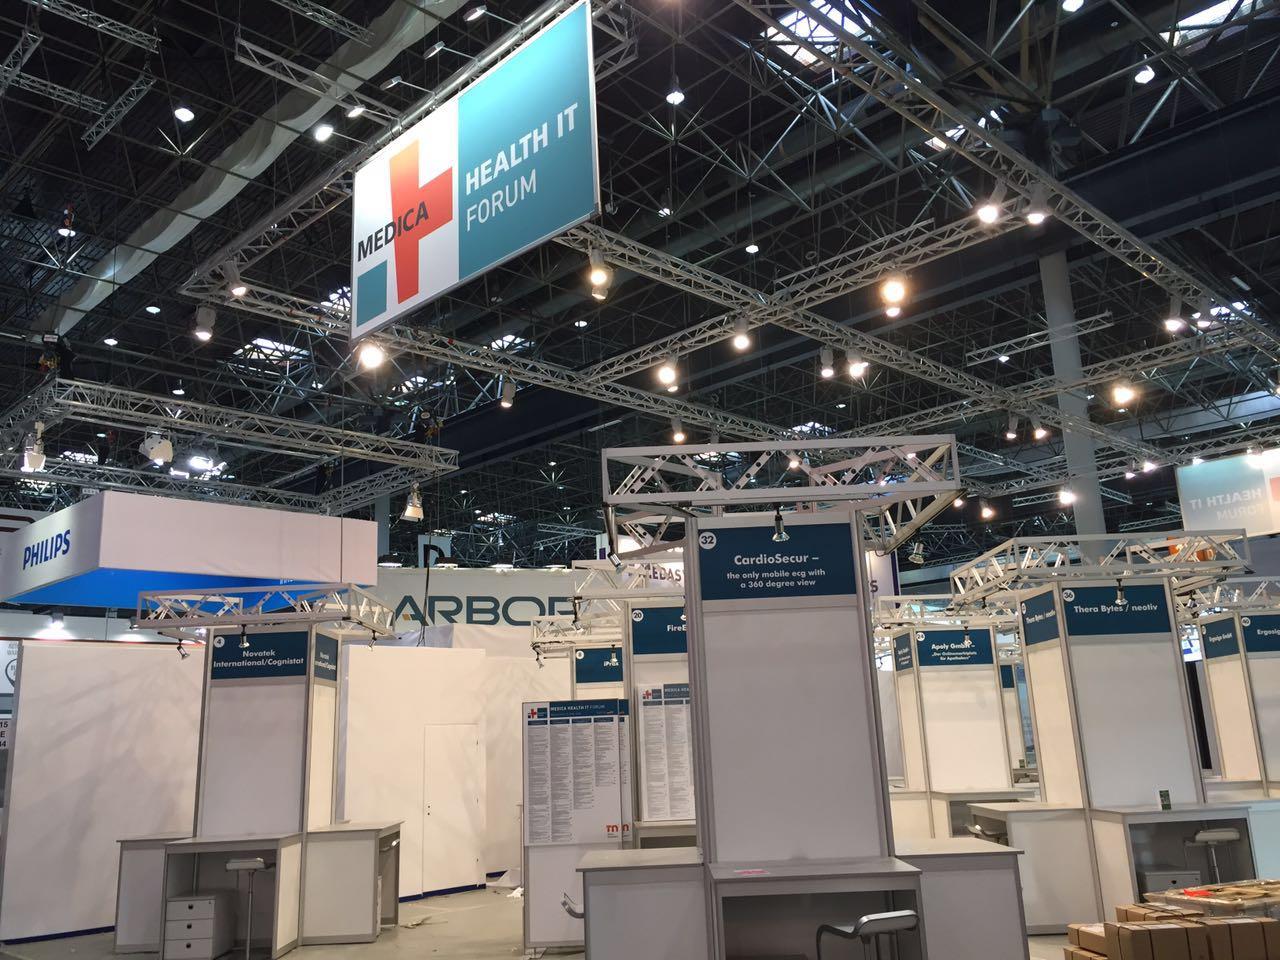 MEDICA 2016 德国杜塞尔多夫国际医疗器械及设备展 静候您的光临!